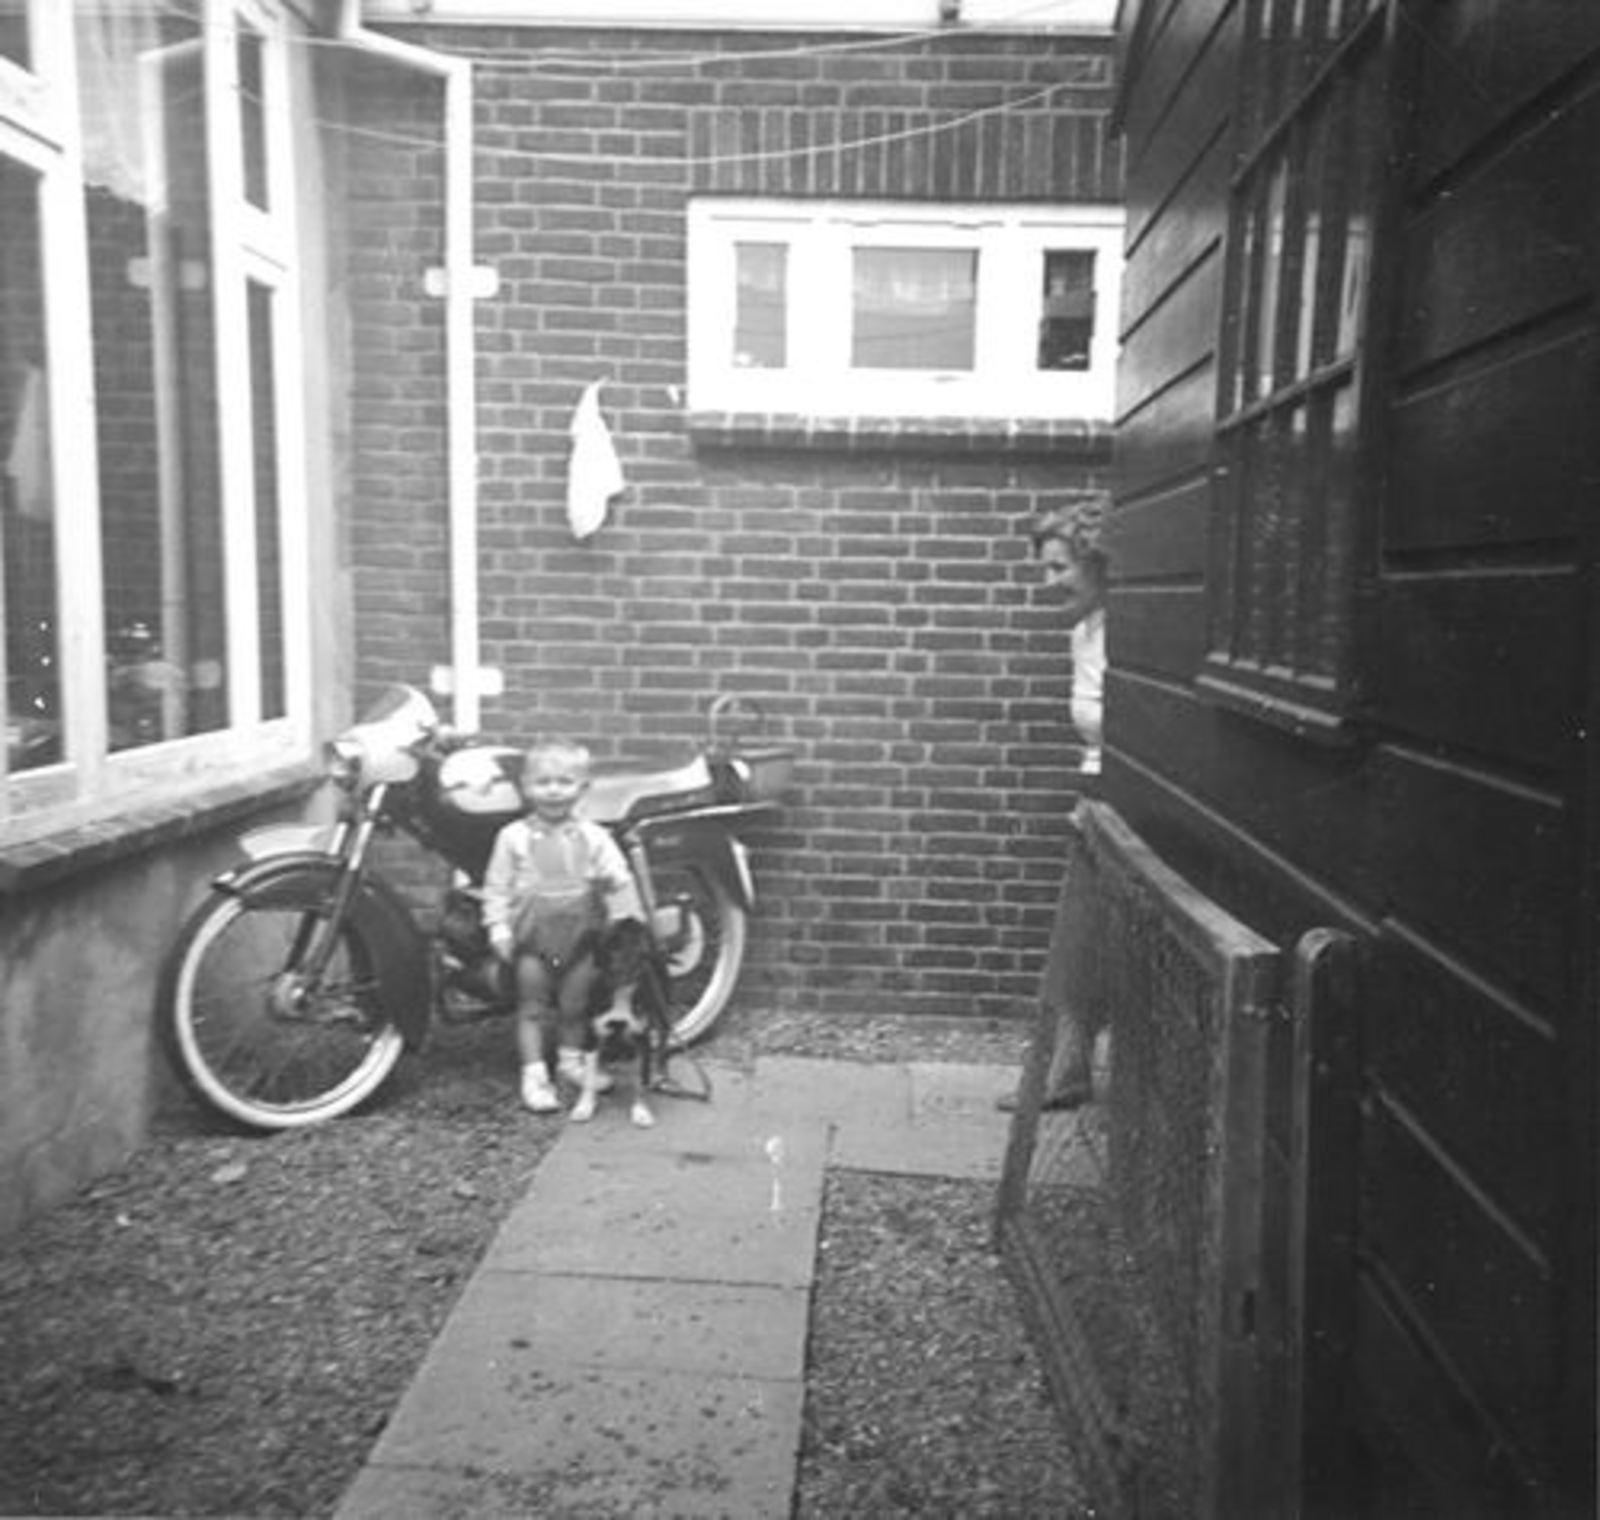 IJweg O 1004 196_ met Leentje Imanse en zoontje Ed op Brommer 02